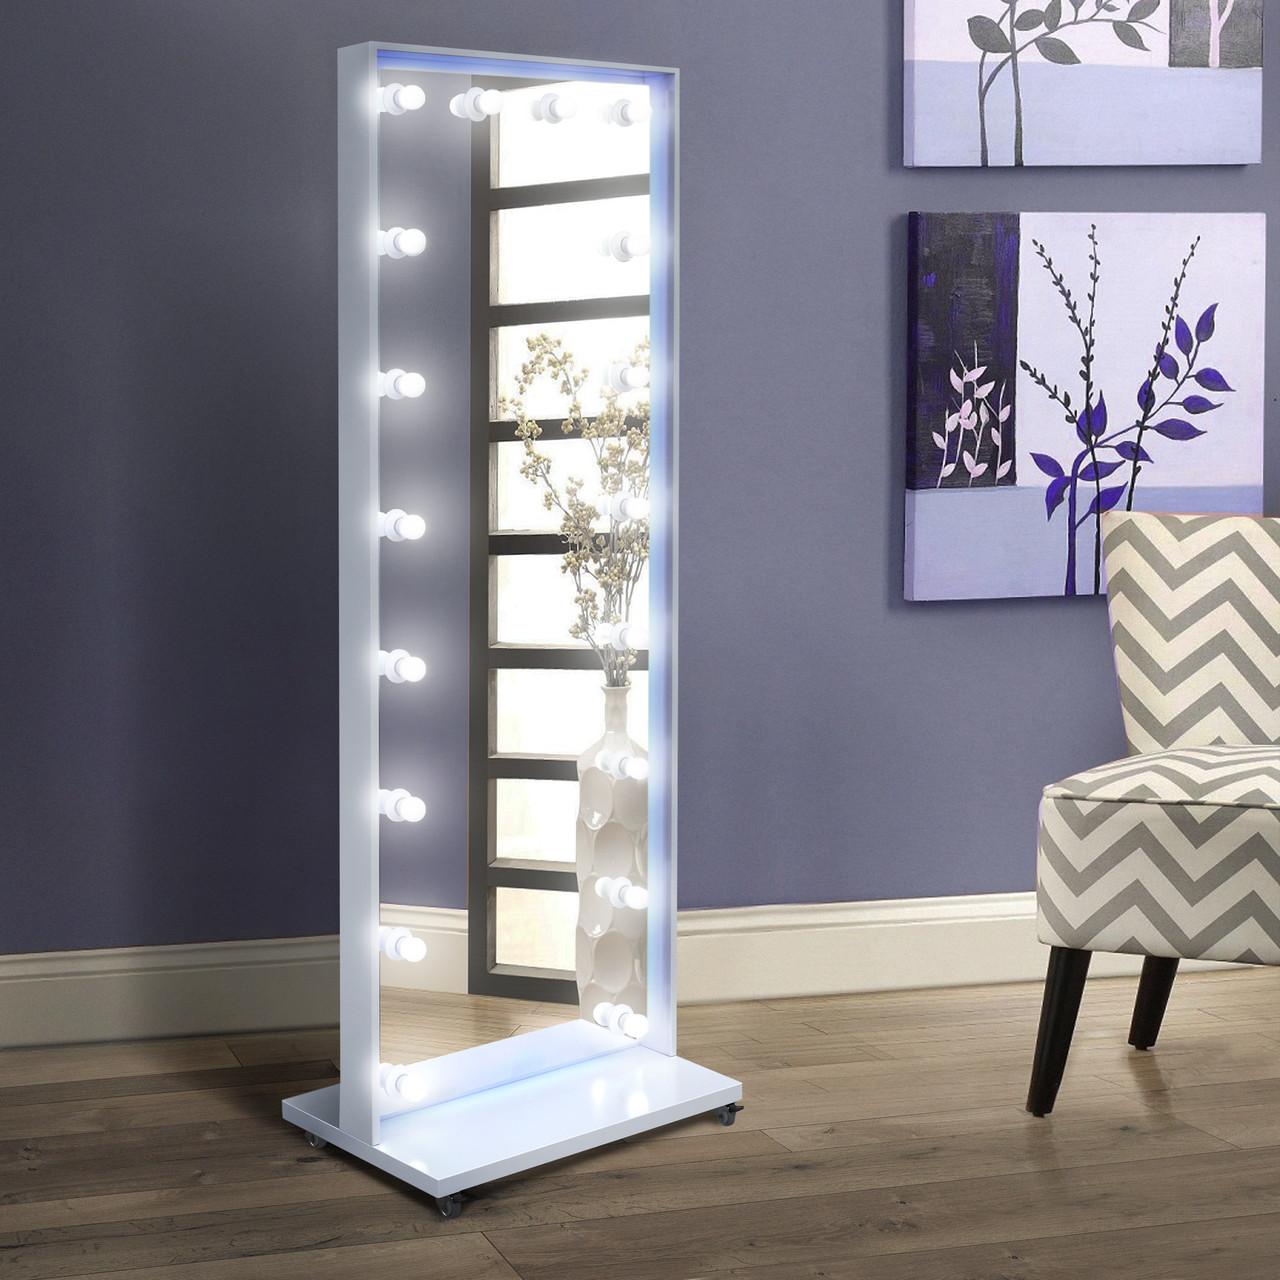 Напольное зеркало с лампочками и Led подсветкой 1900х700 мм